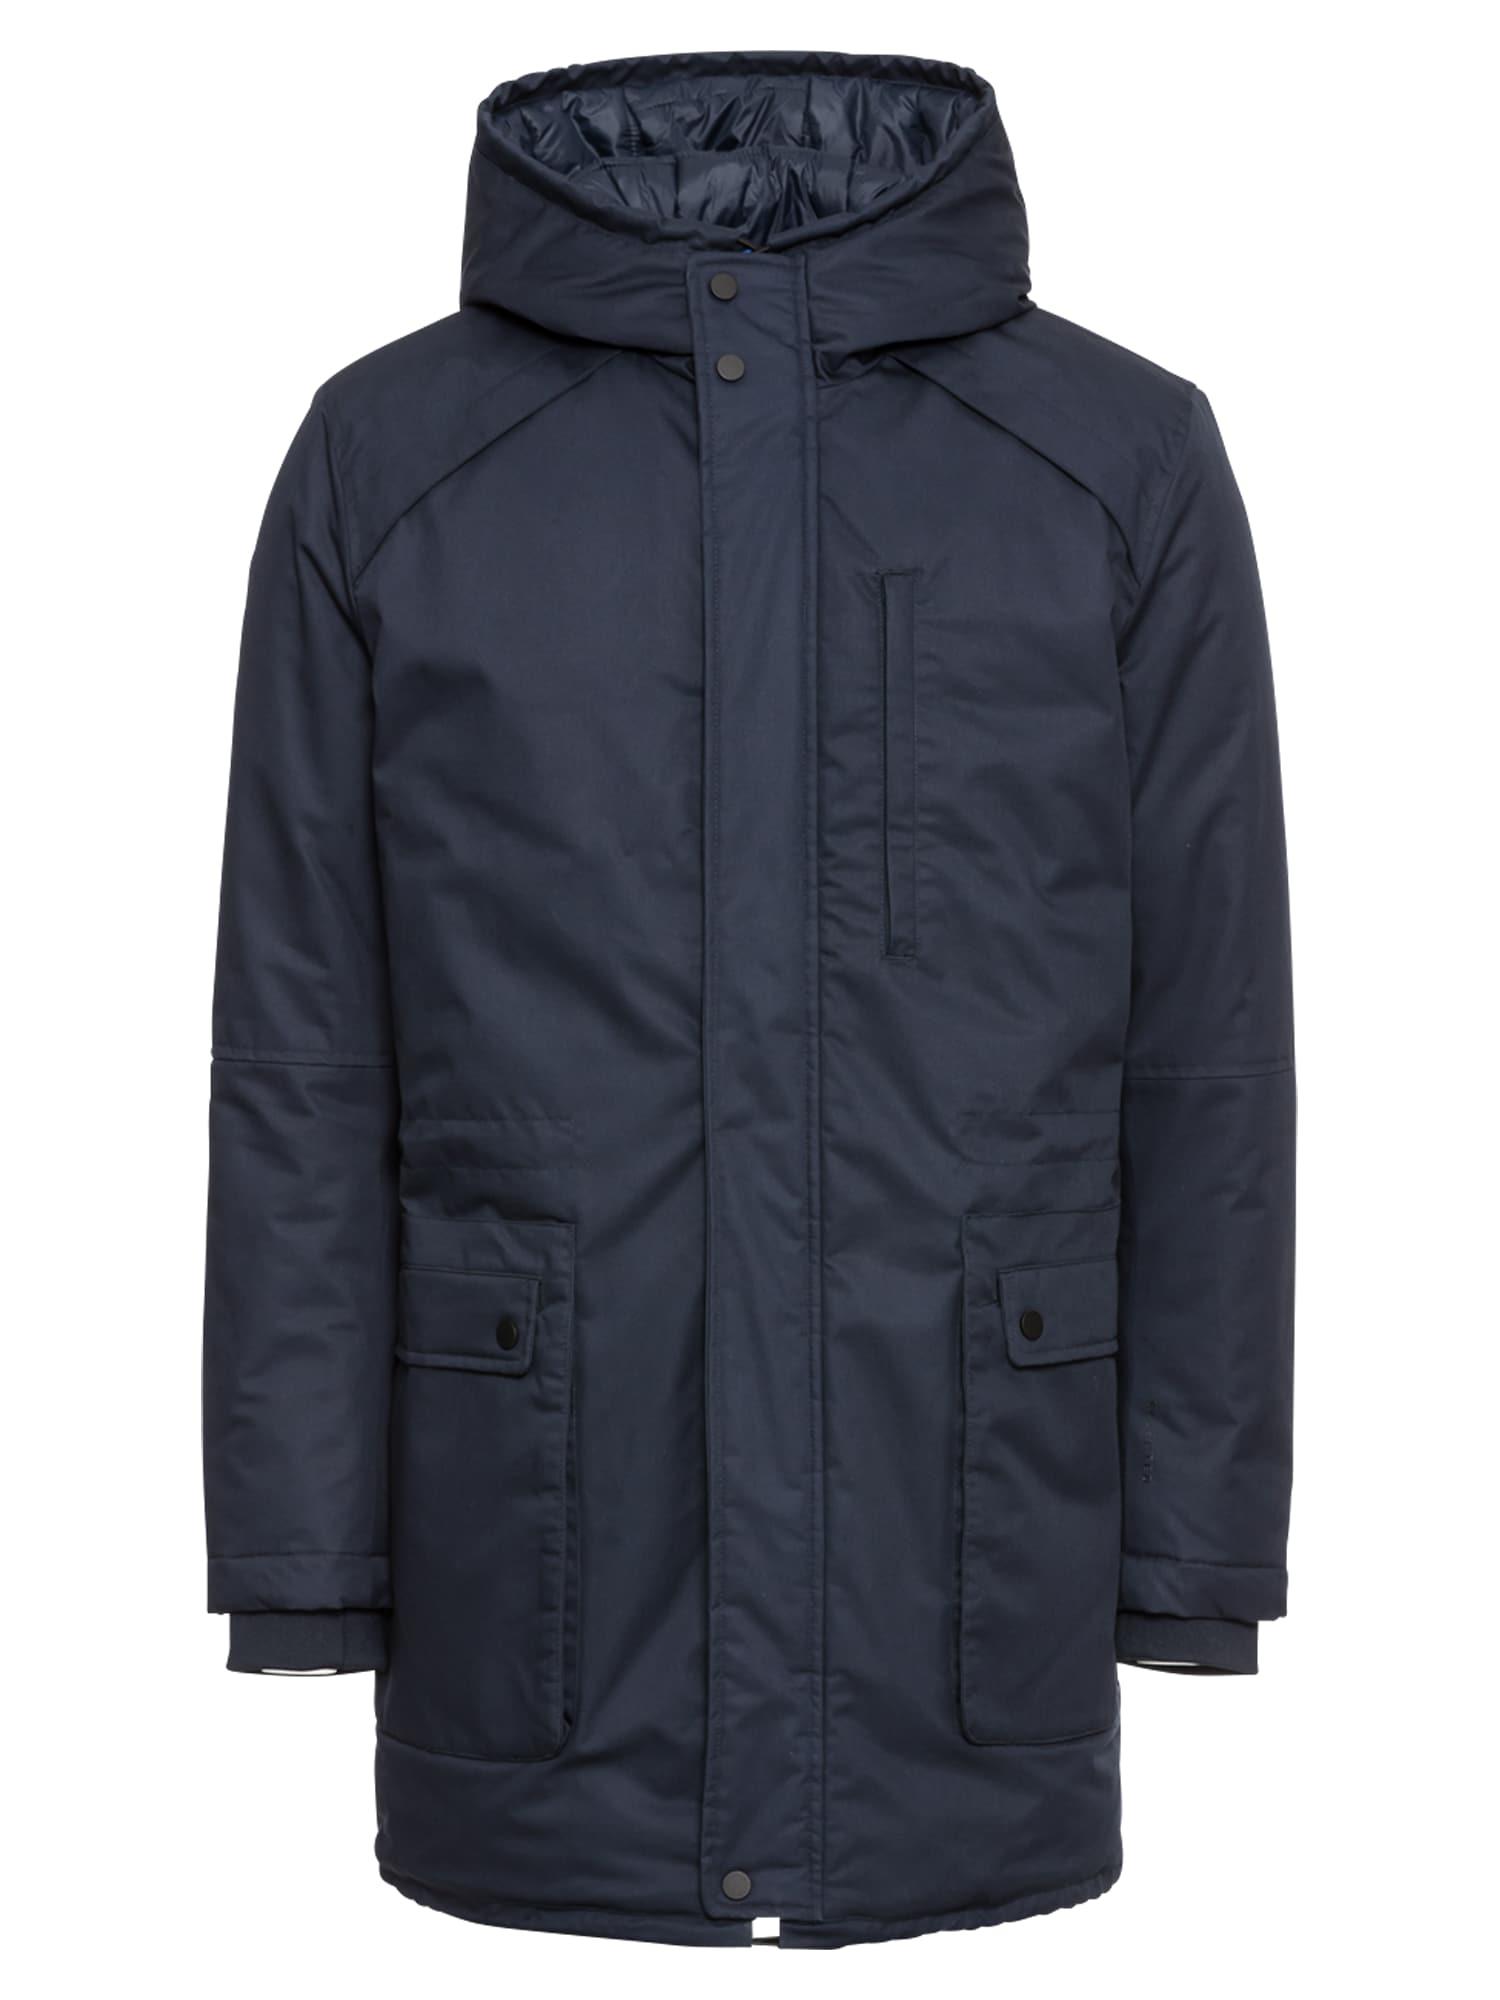 Zimní bunda SLHVINYL JACKET B námořnická modř SELECTED HOMME